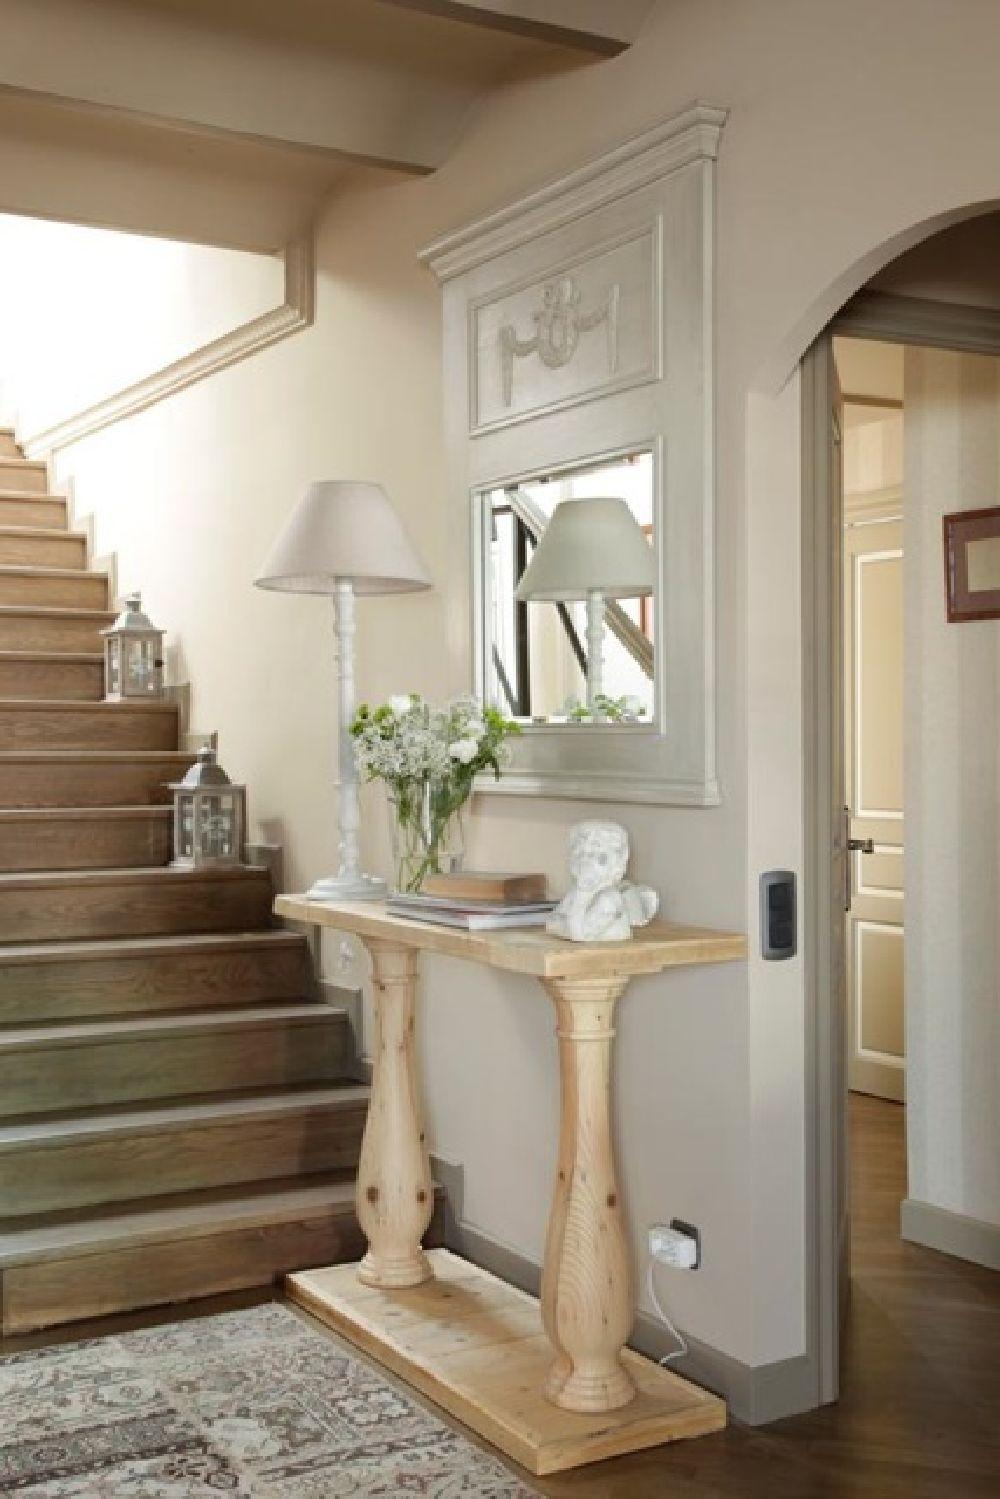 adelaparvu.com despre locuinta parter si mansarda in stil combinat clasic si rustic, designer Jeanette Tresing, Foto Jeanette Tresing (7)